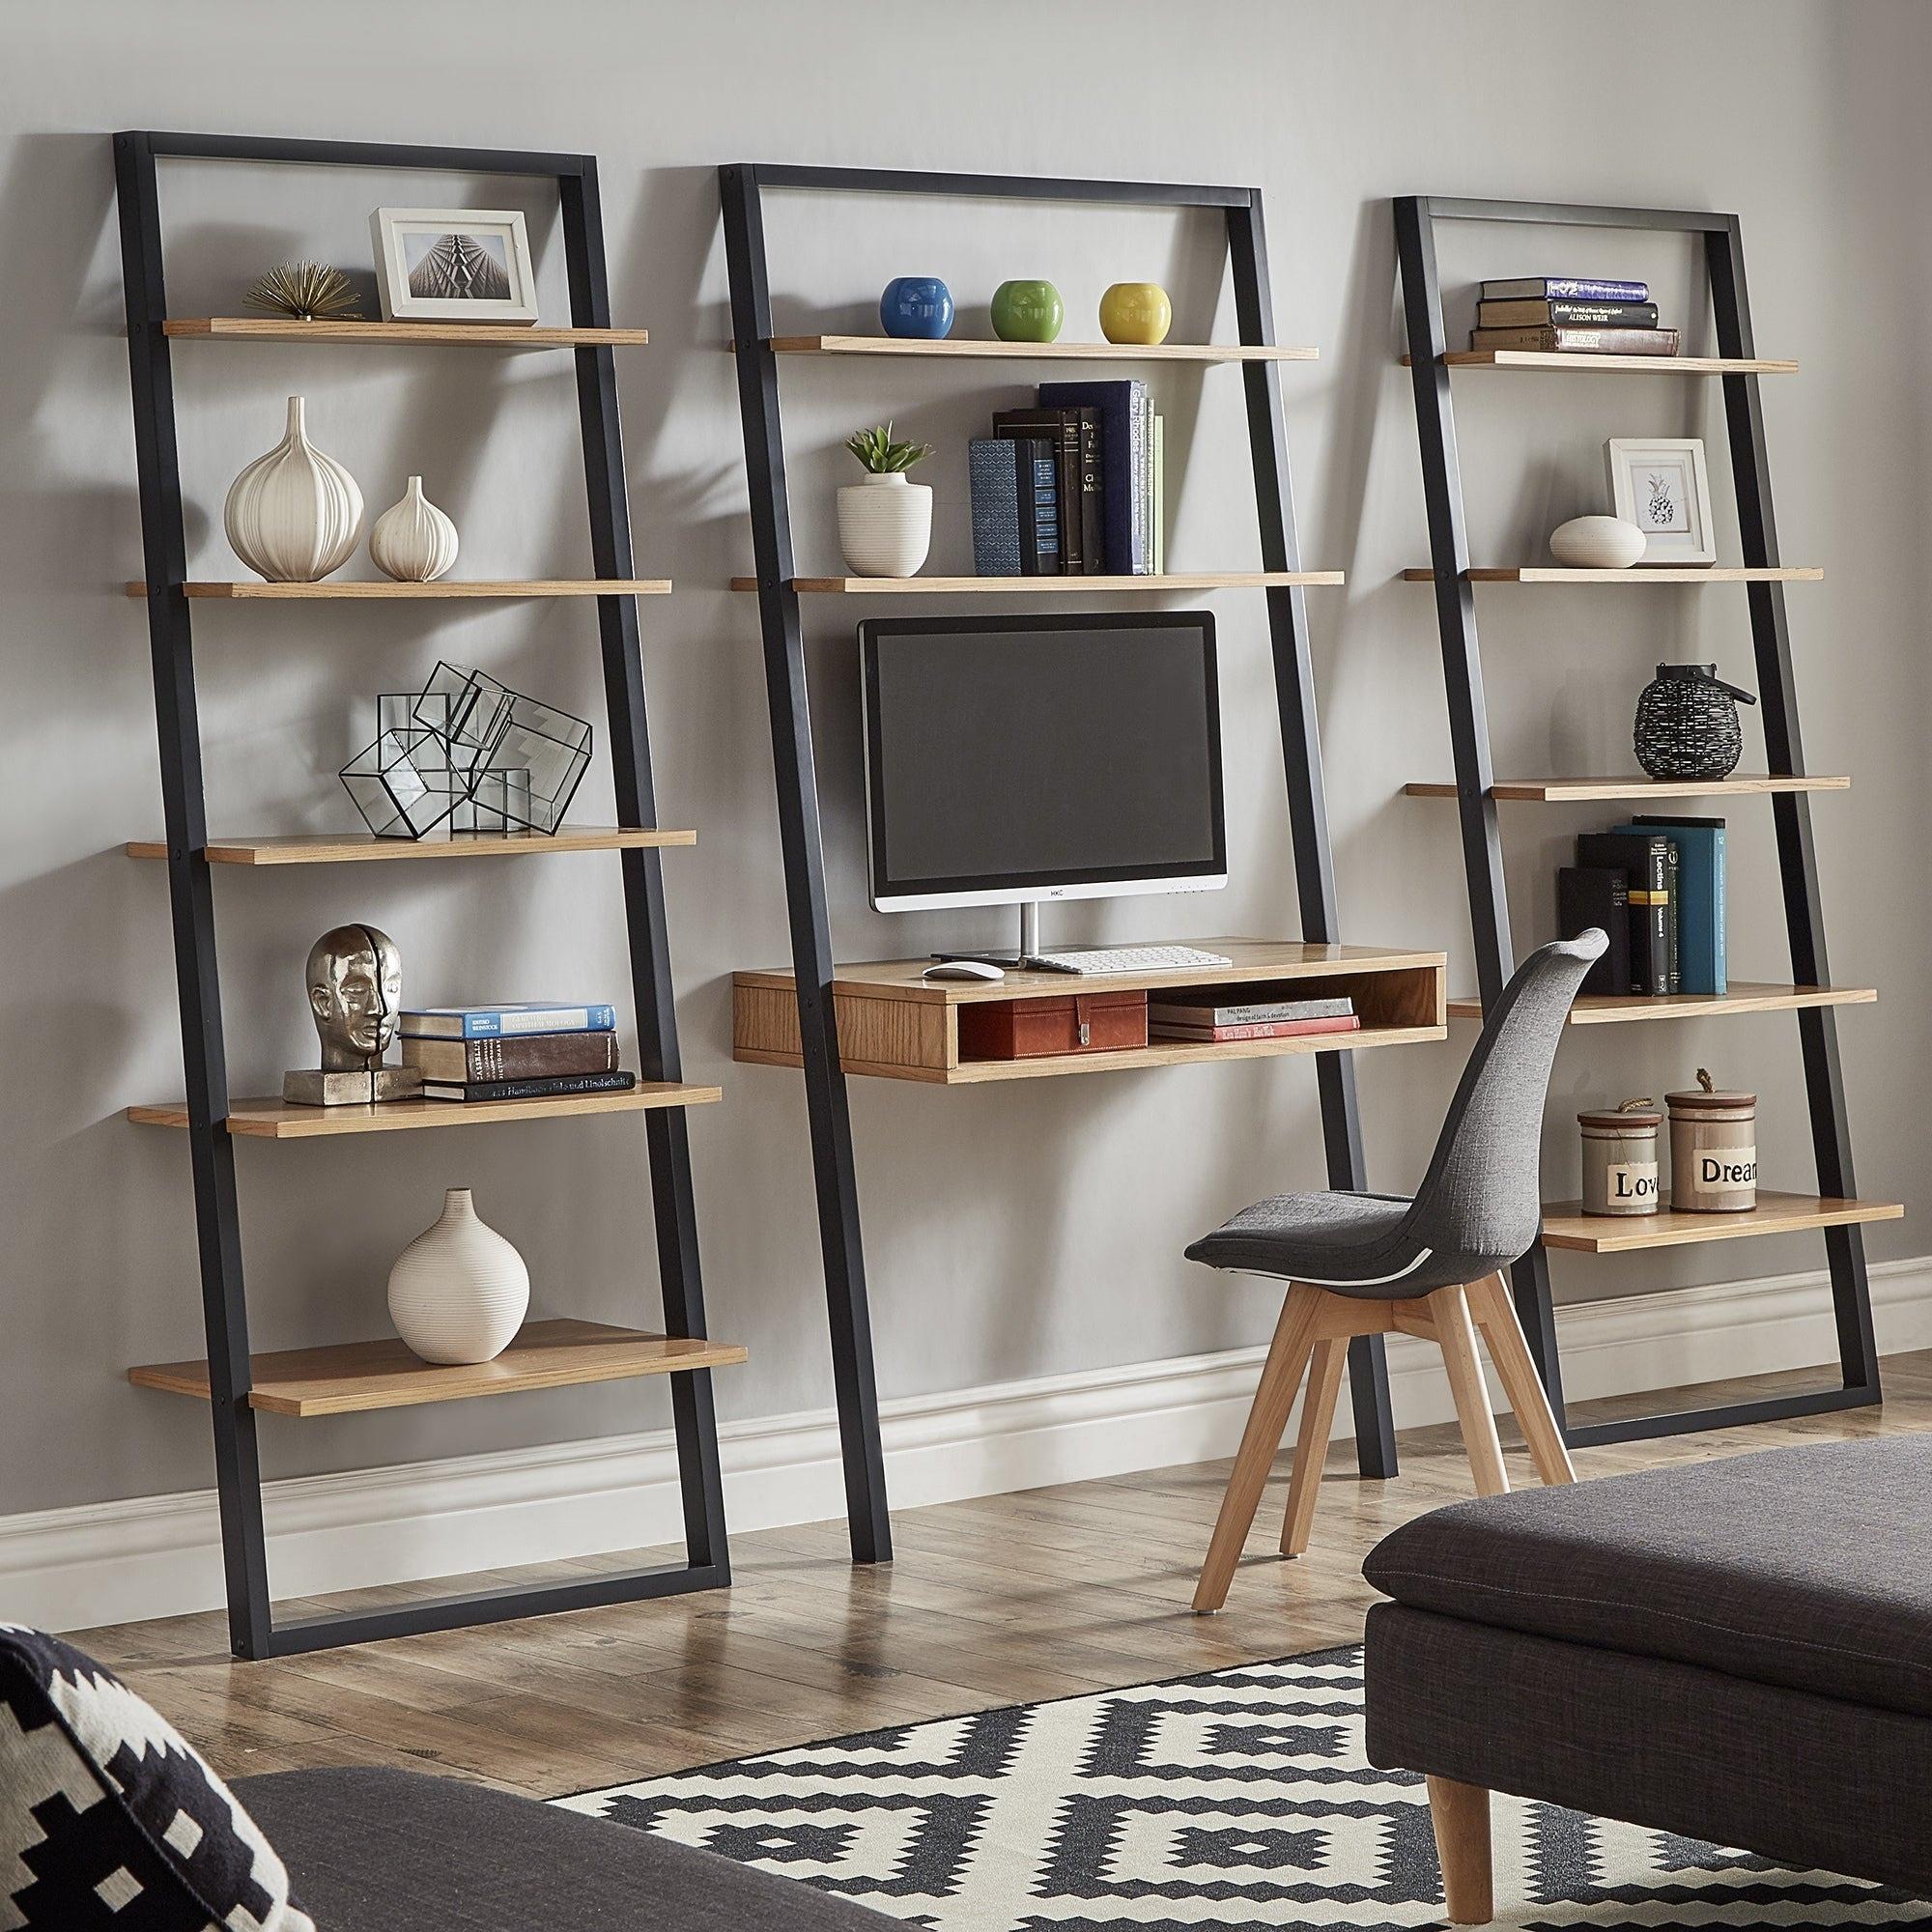 Ranell Leaning Ladder Shelves By Inspire Q Modern Overstock 16489724